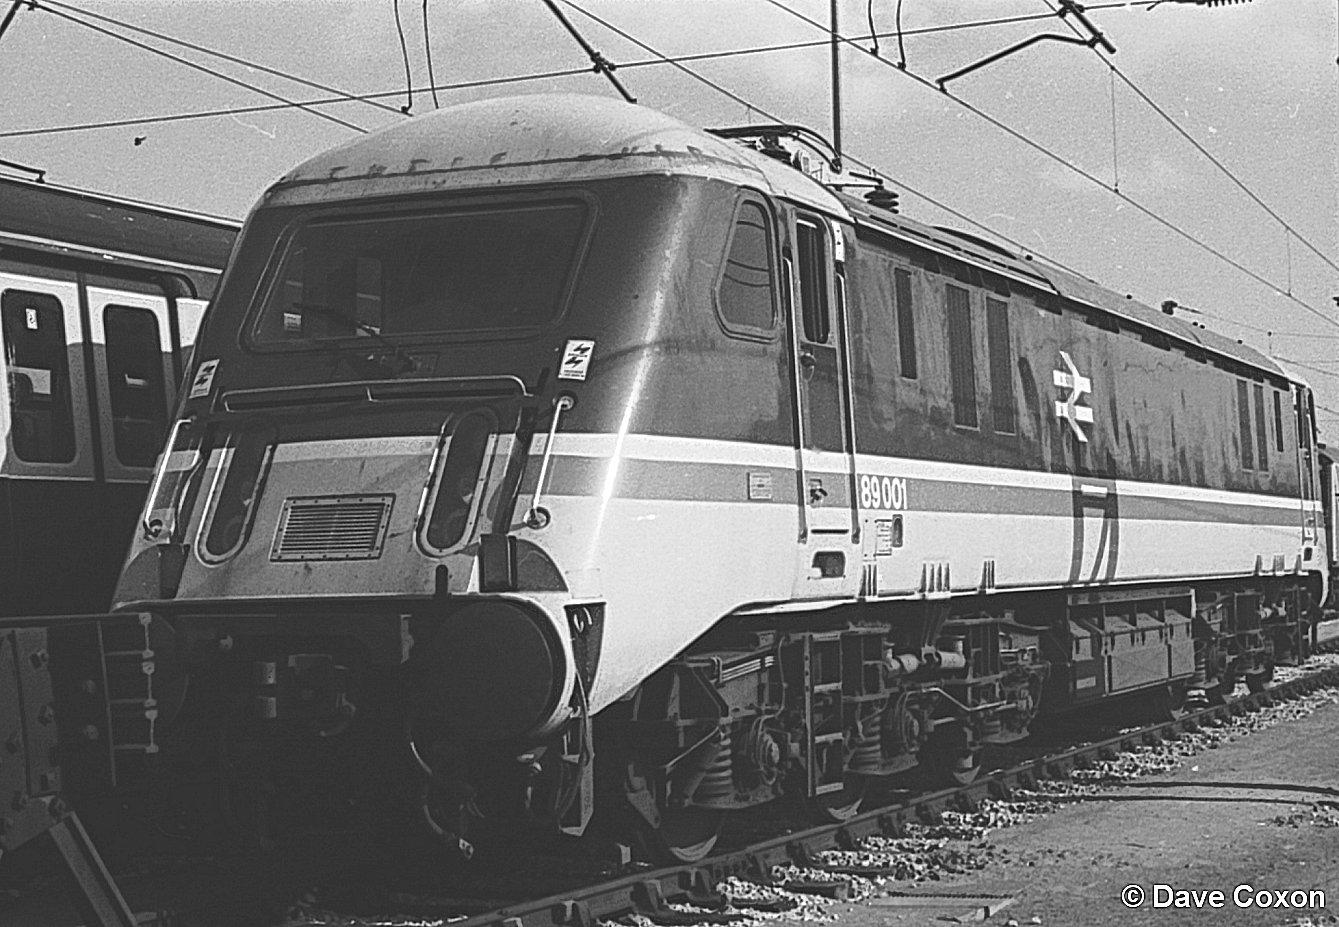 Class 89 AC co-co loco